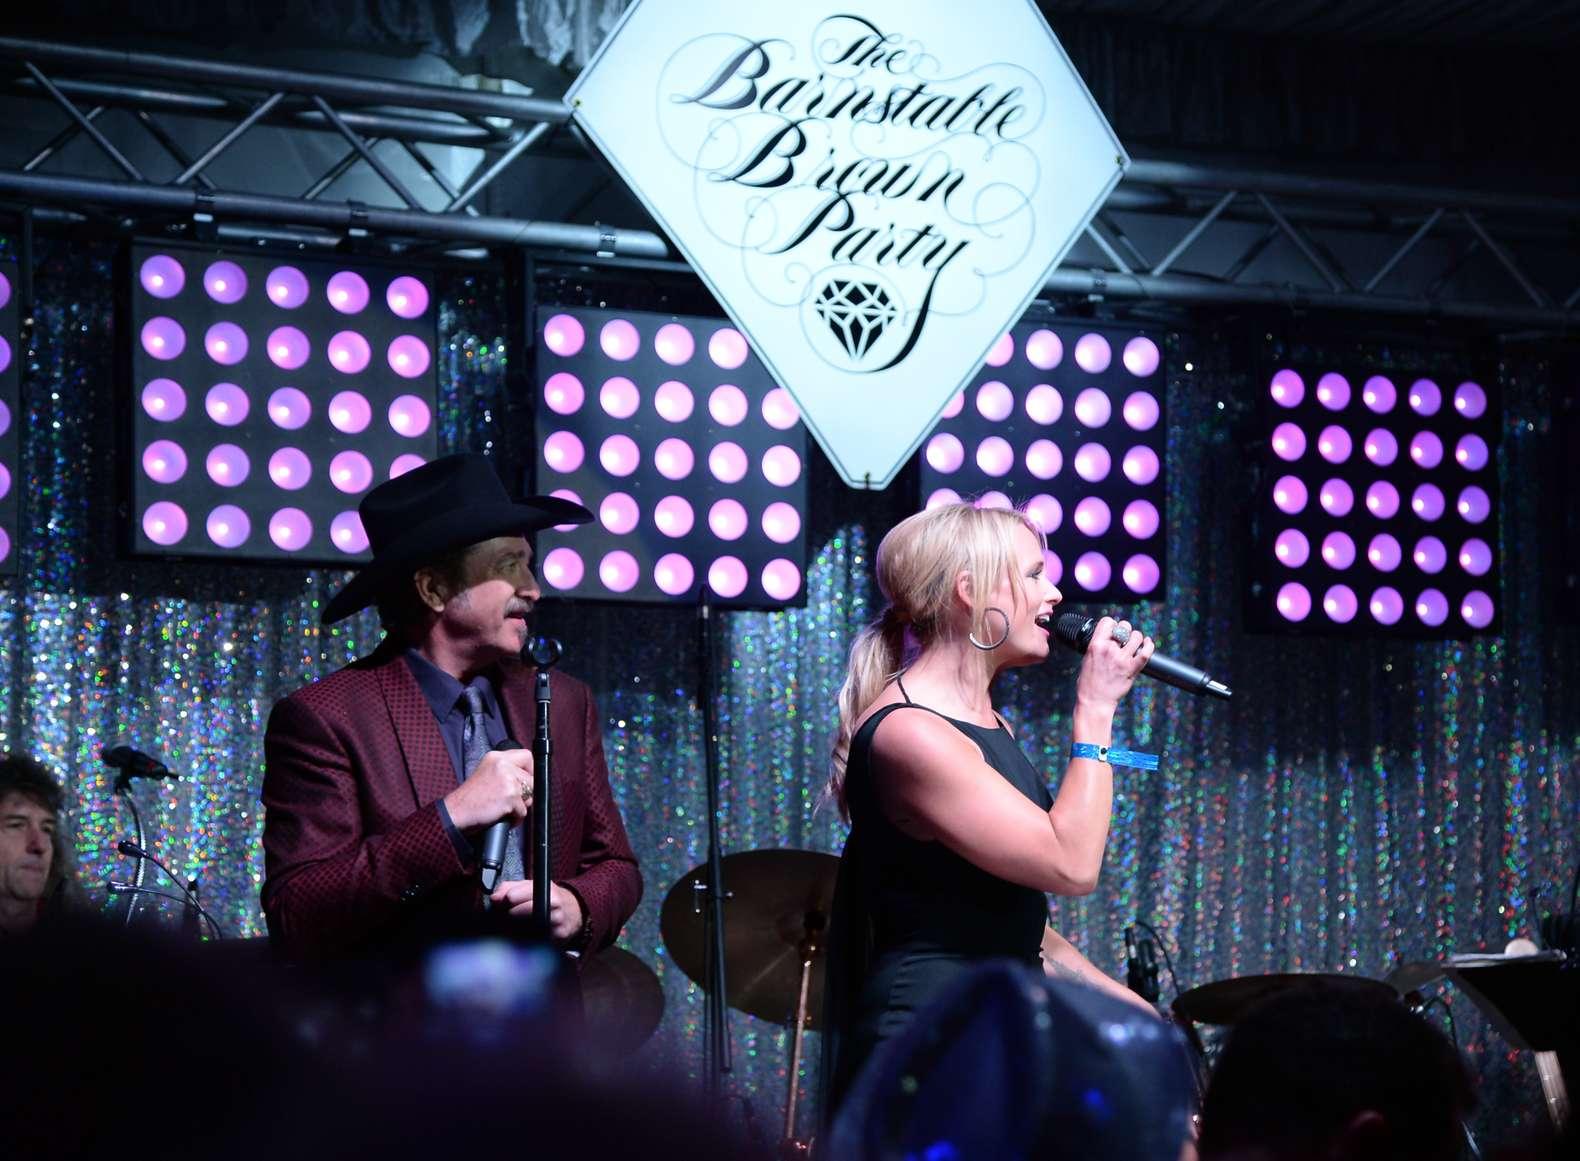 Miranda Lambert Barnstable Brown Derby Gala